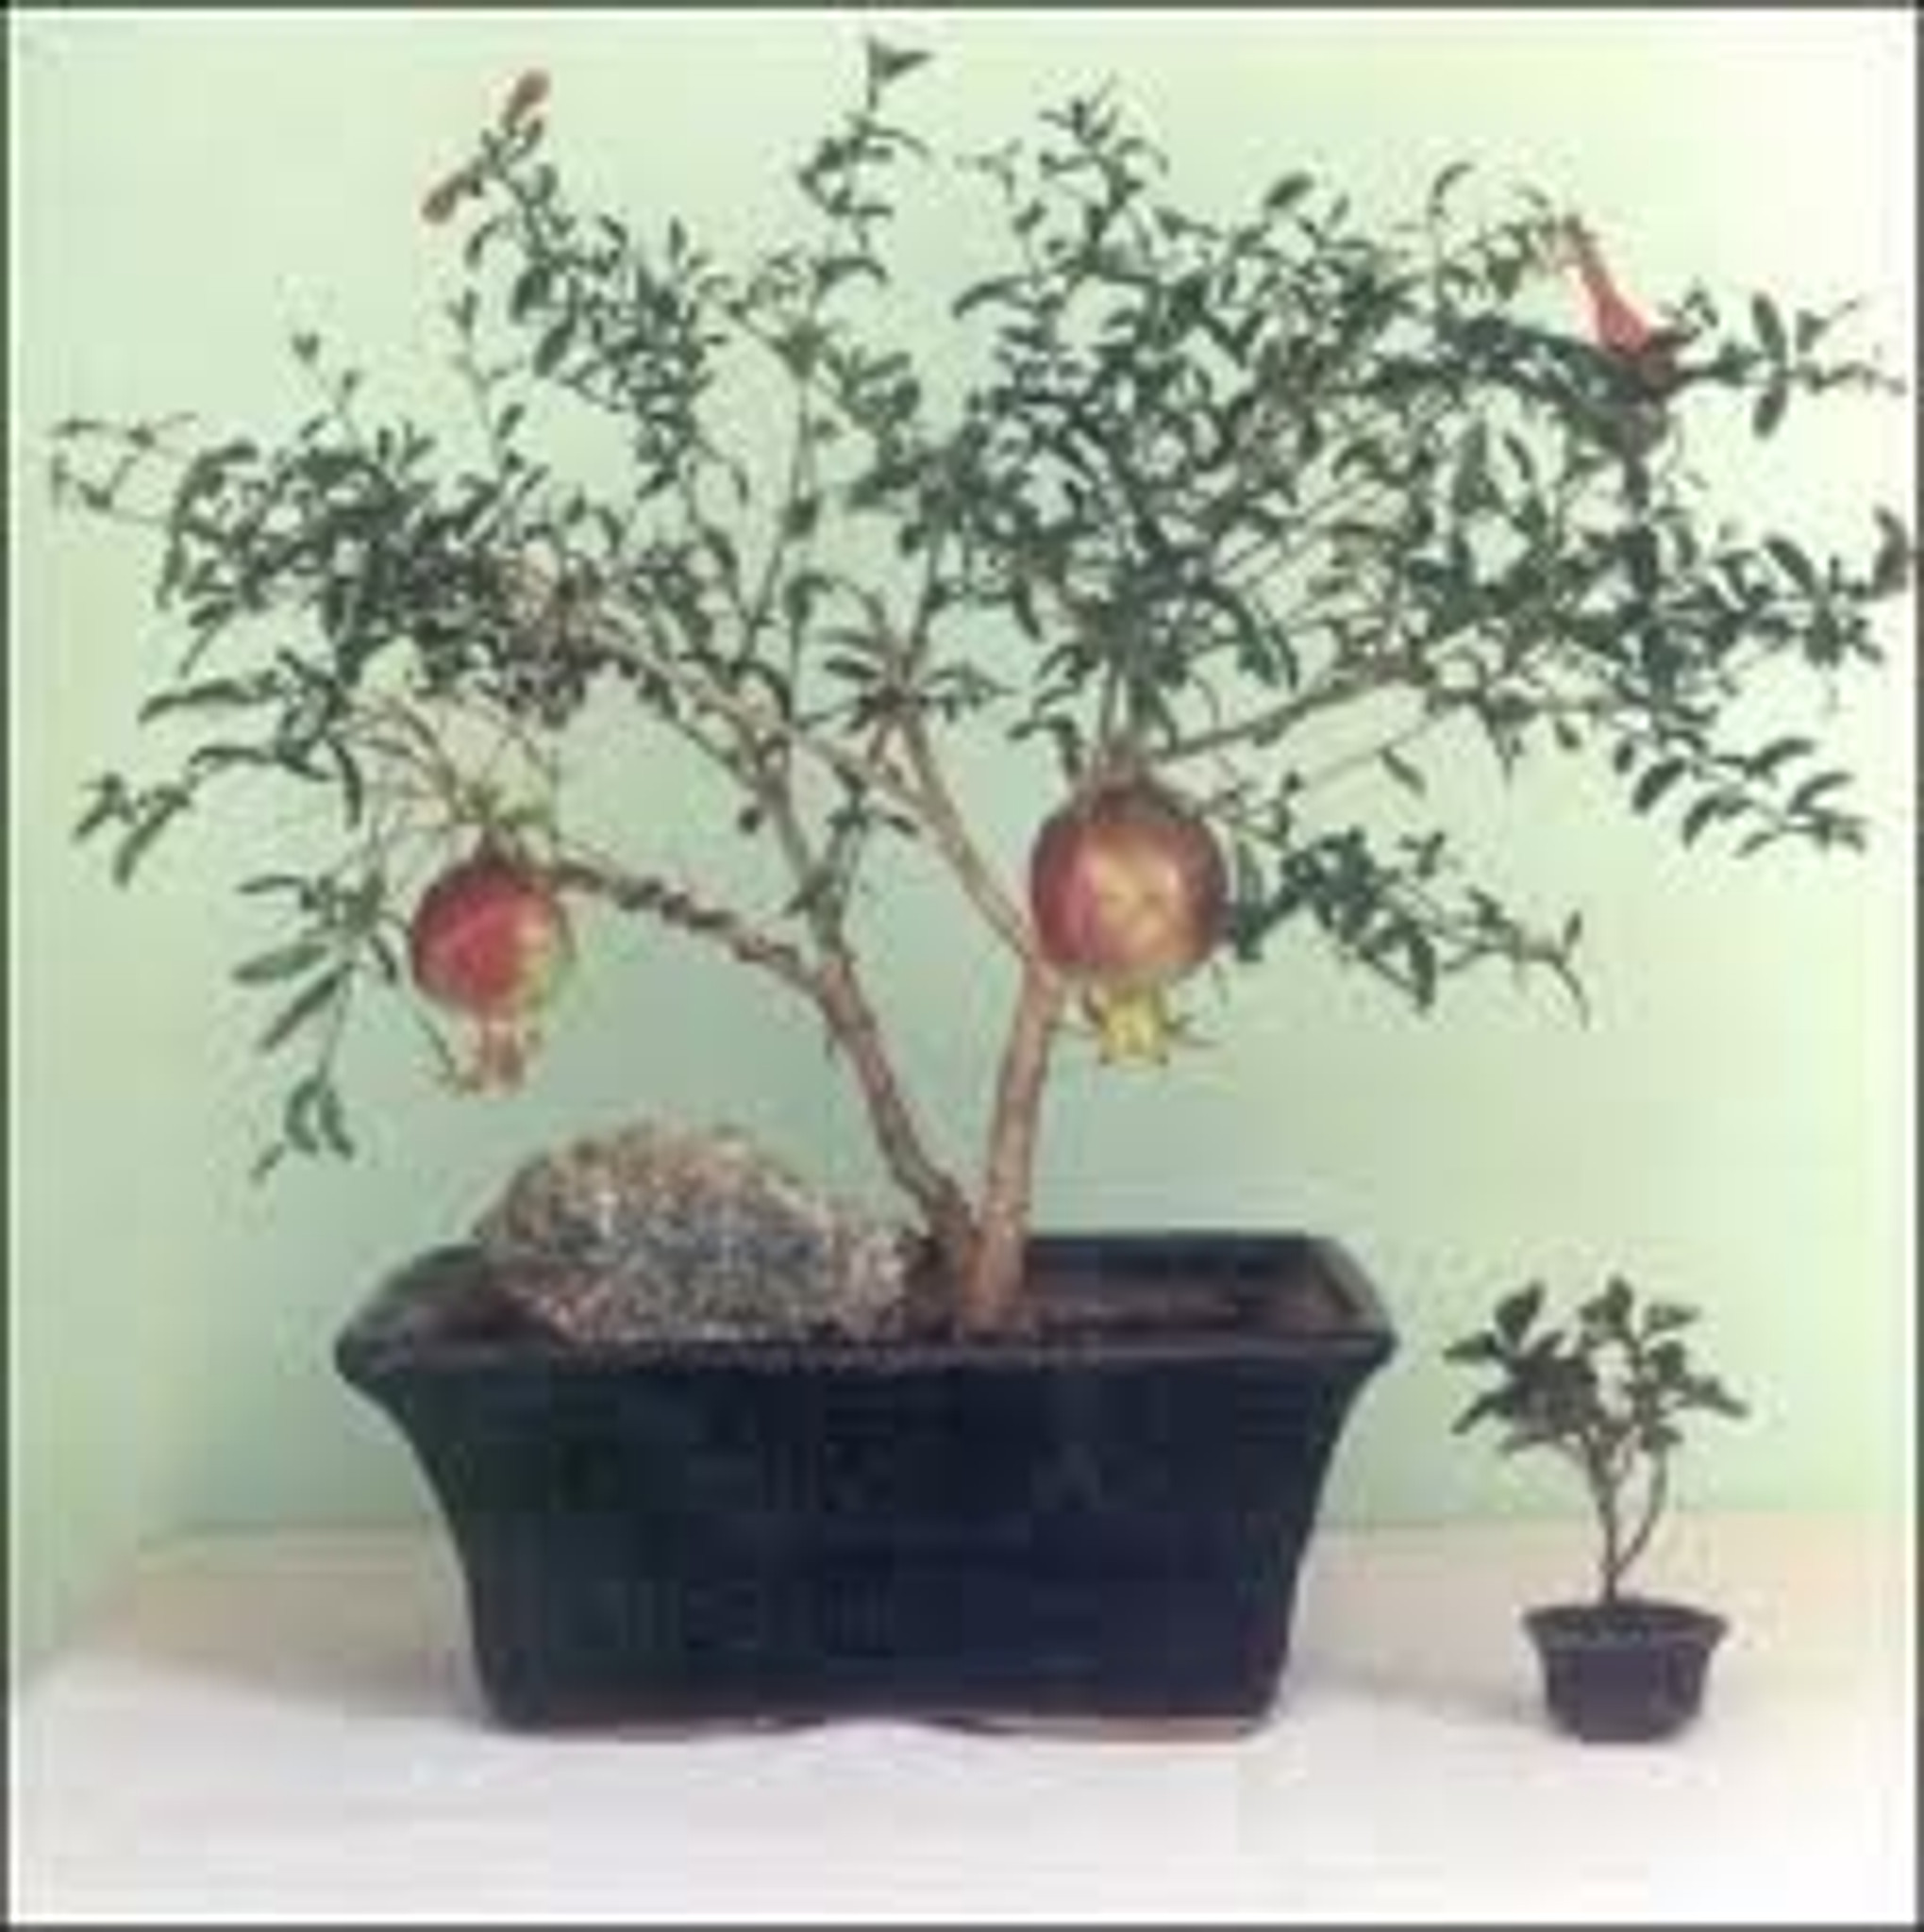 dwarf pomegranate flowering shrub